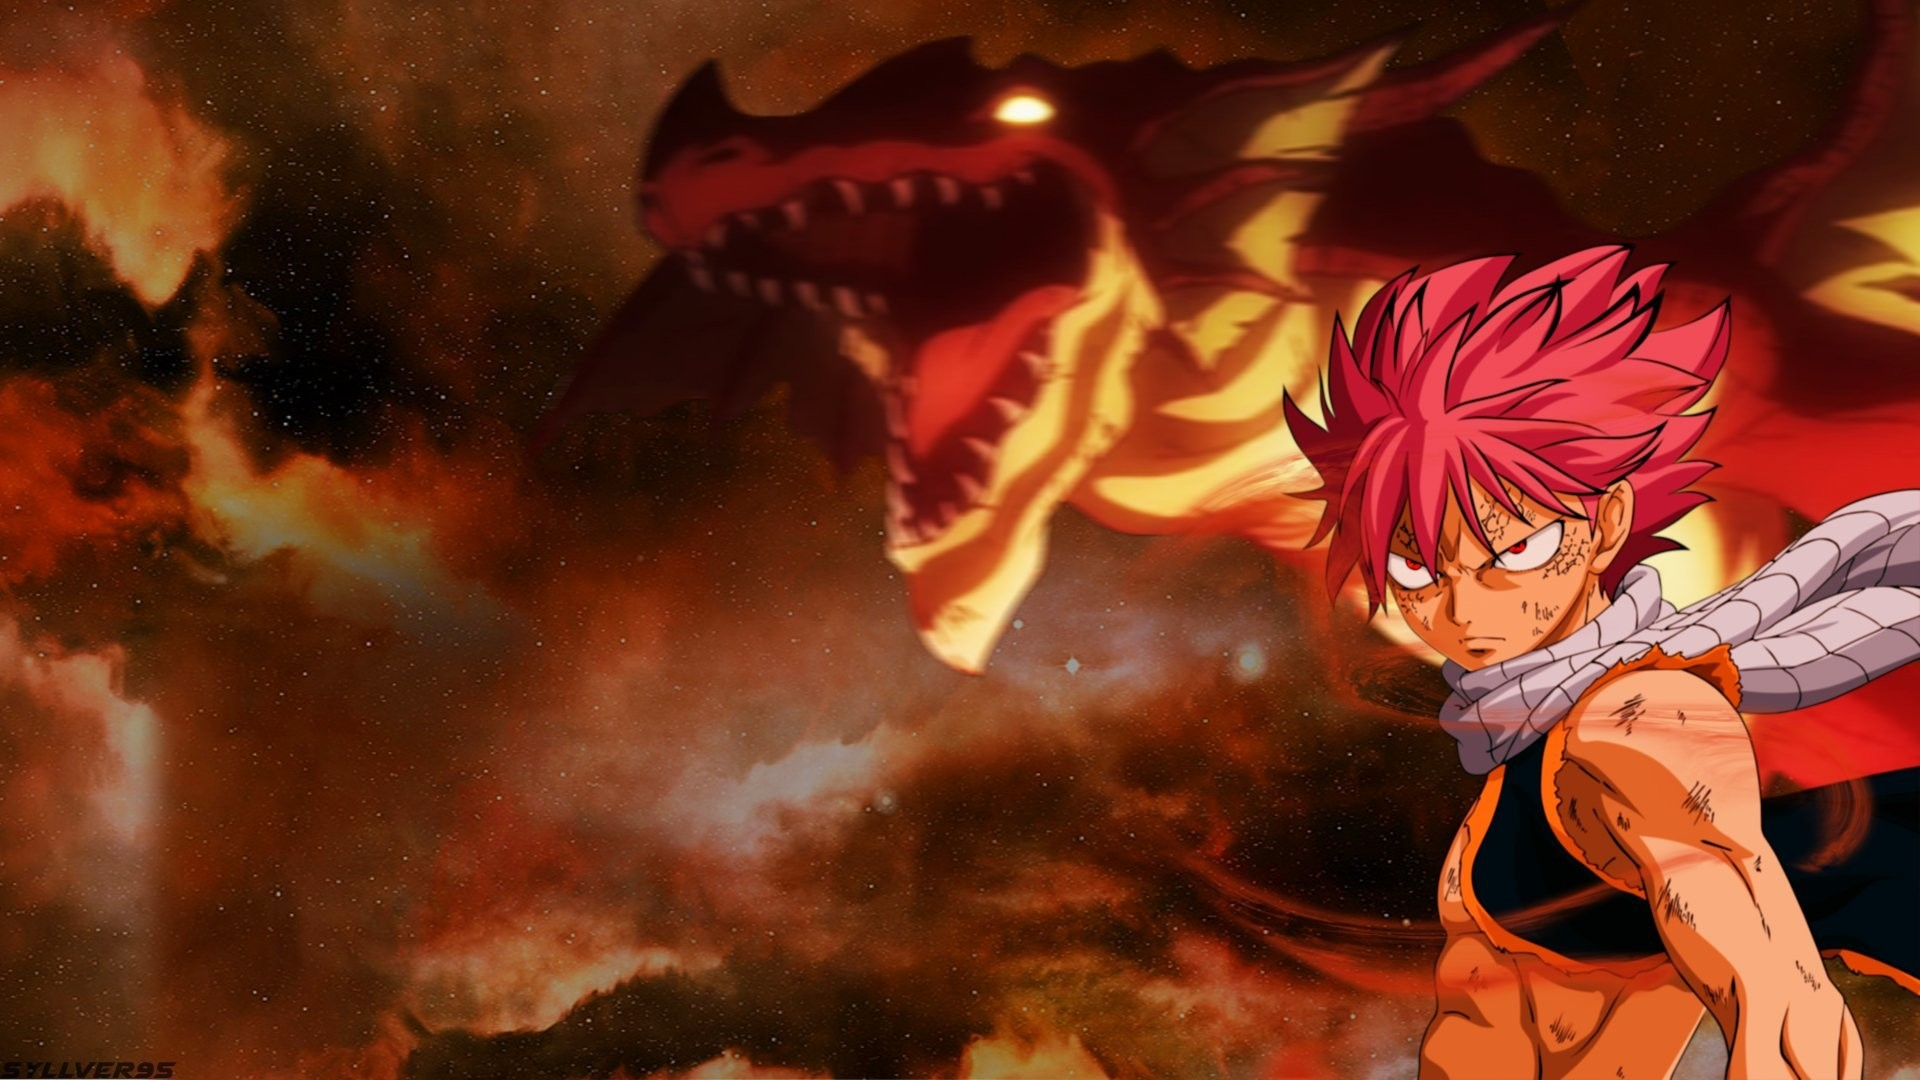 Fairy Tail Igneel Natsu Dragneel Drachen Feuer Anime - Natsu Mod Dragon Ball Xenoverse 2 - HD Wallpaper